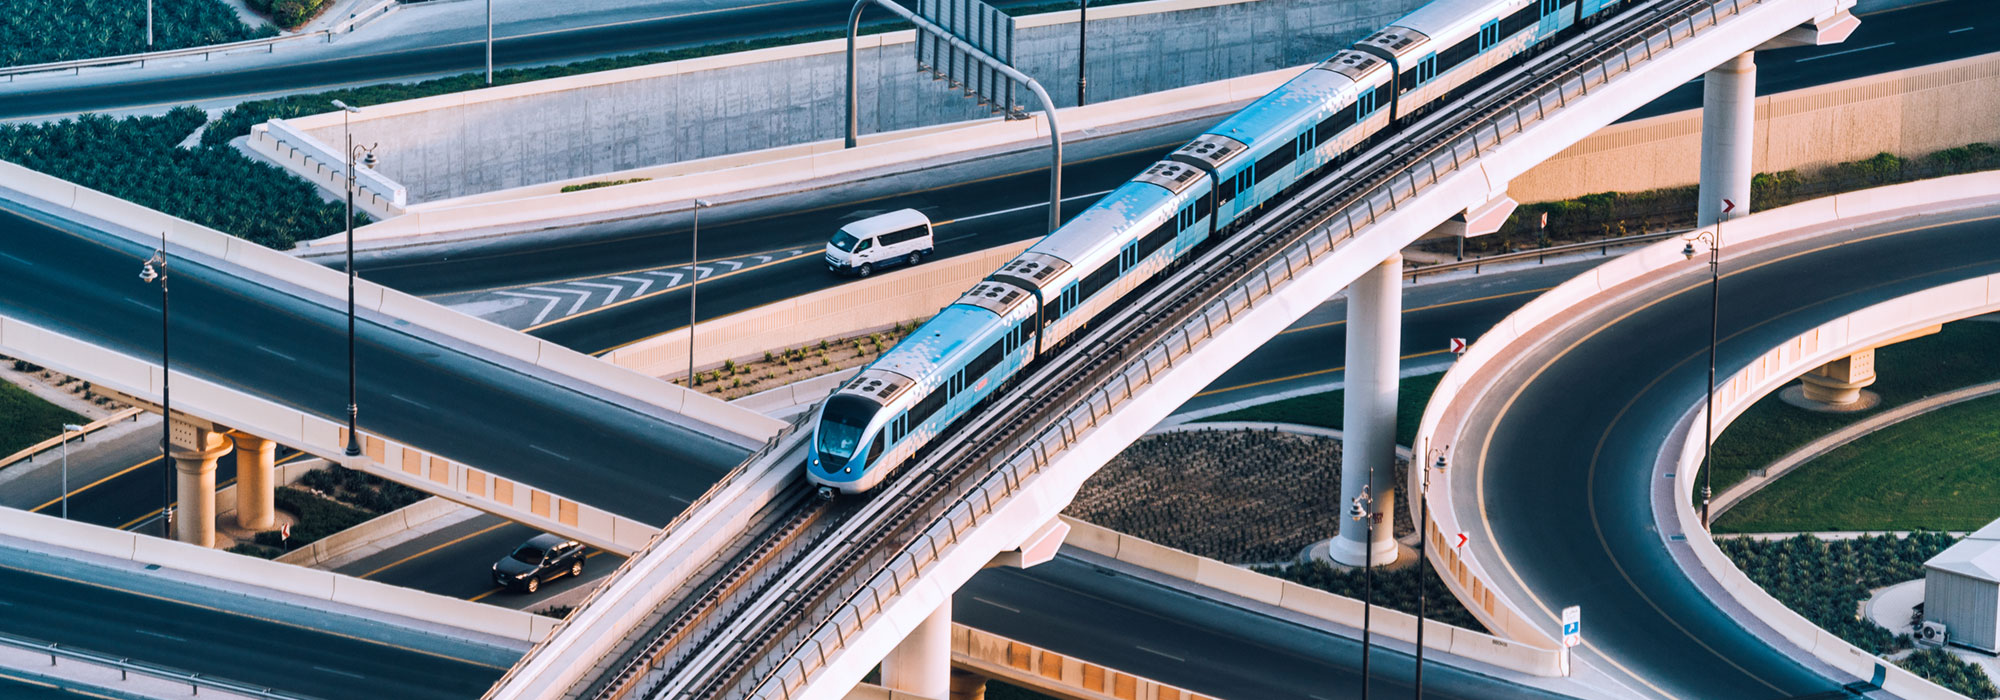 Transportmittel in Dubai